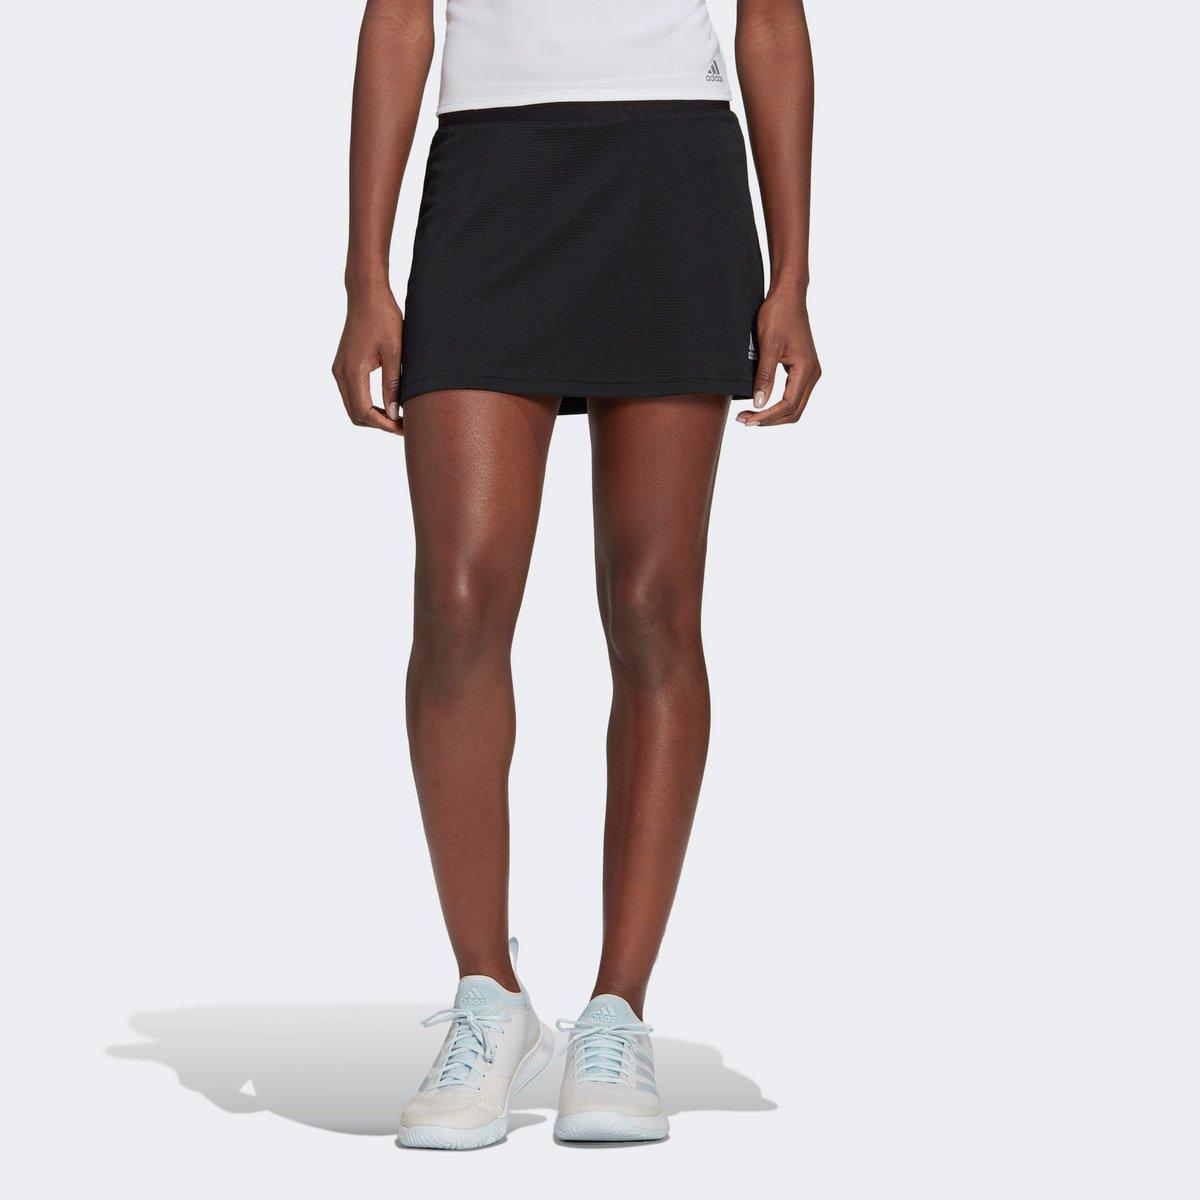 Saia Adidas Club Tennis C/ Bermuda Interna